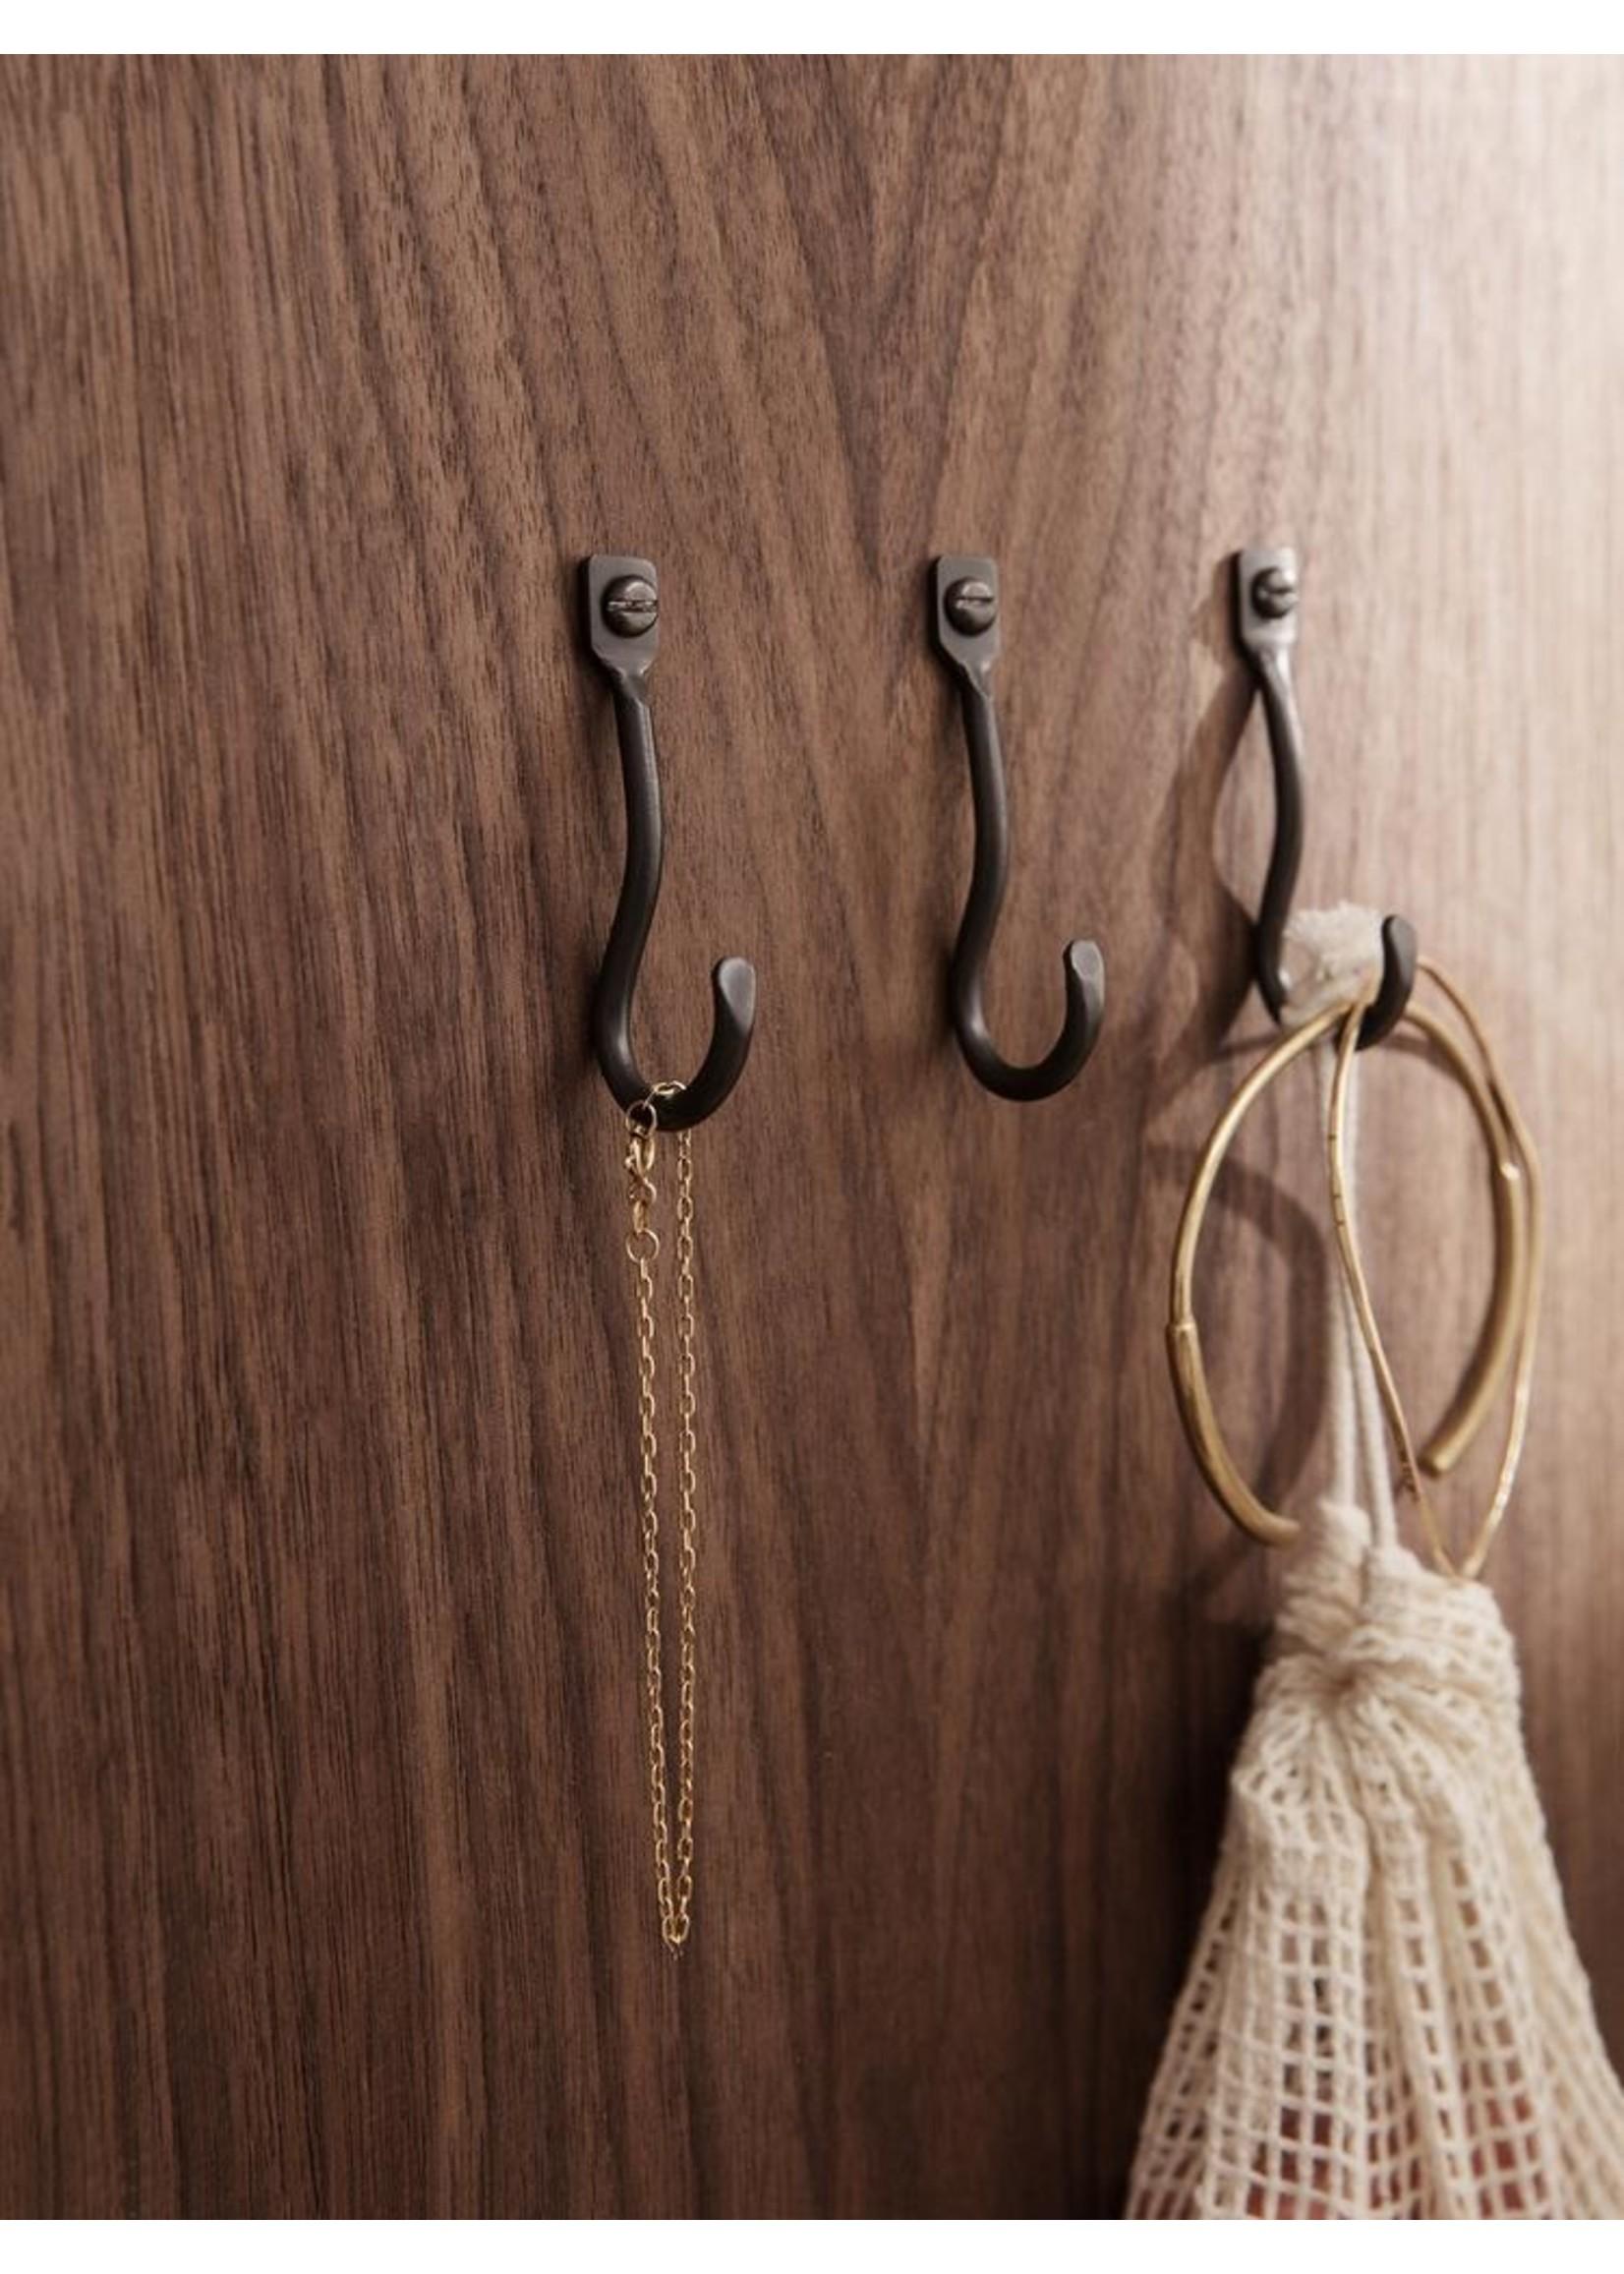 ferm LIVING ferm LIVING Curvature Small Hooks - Set of 3 - Black Brass